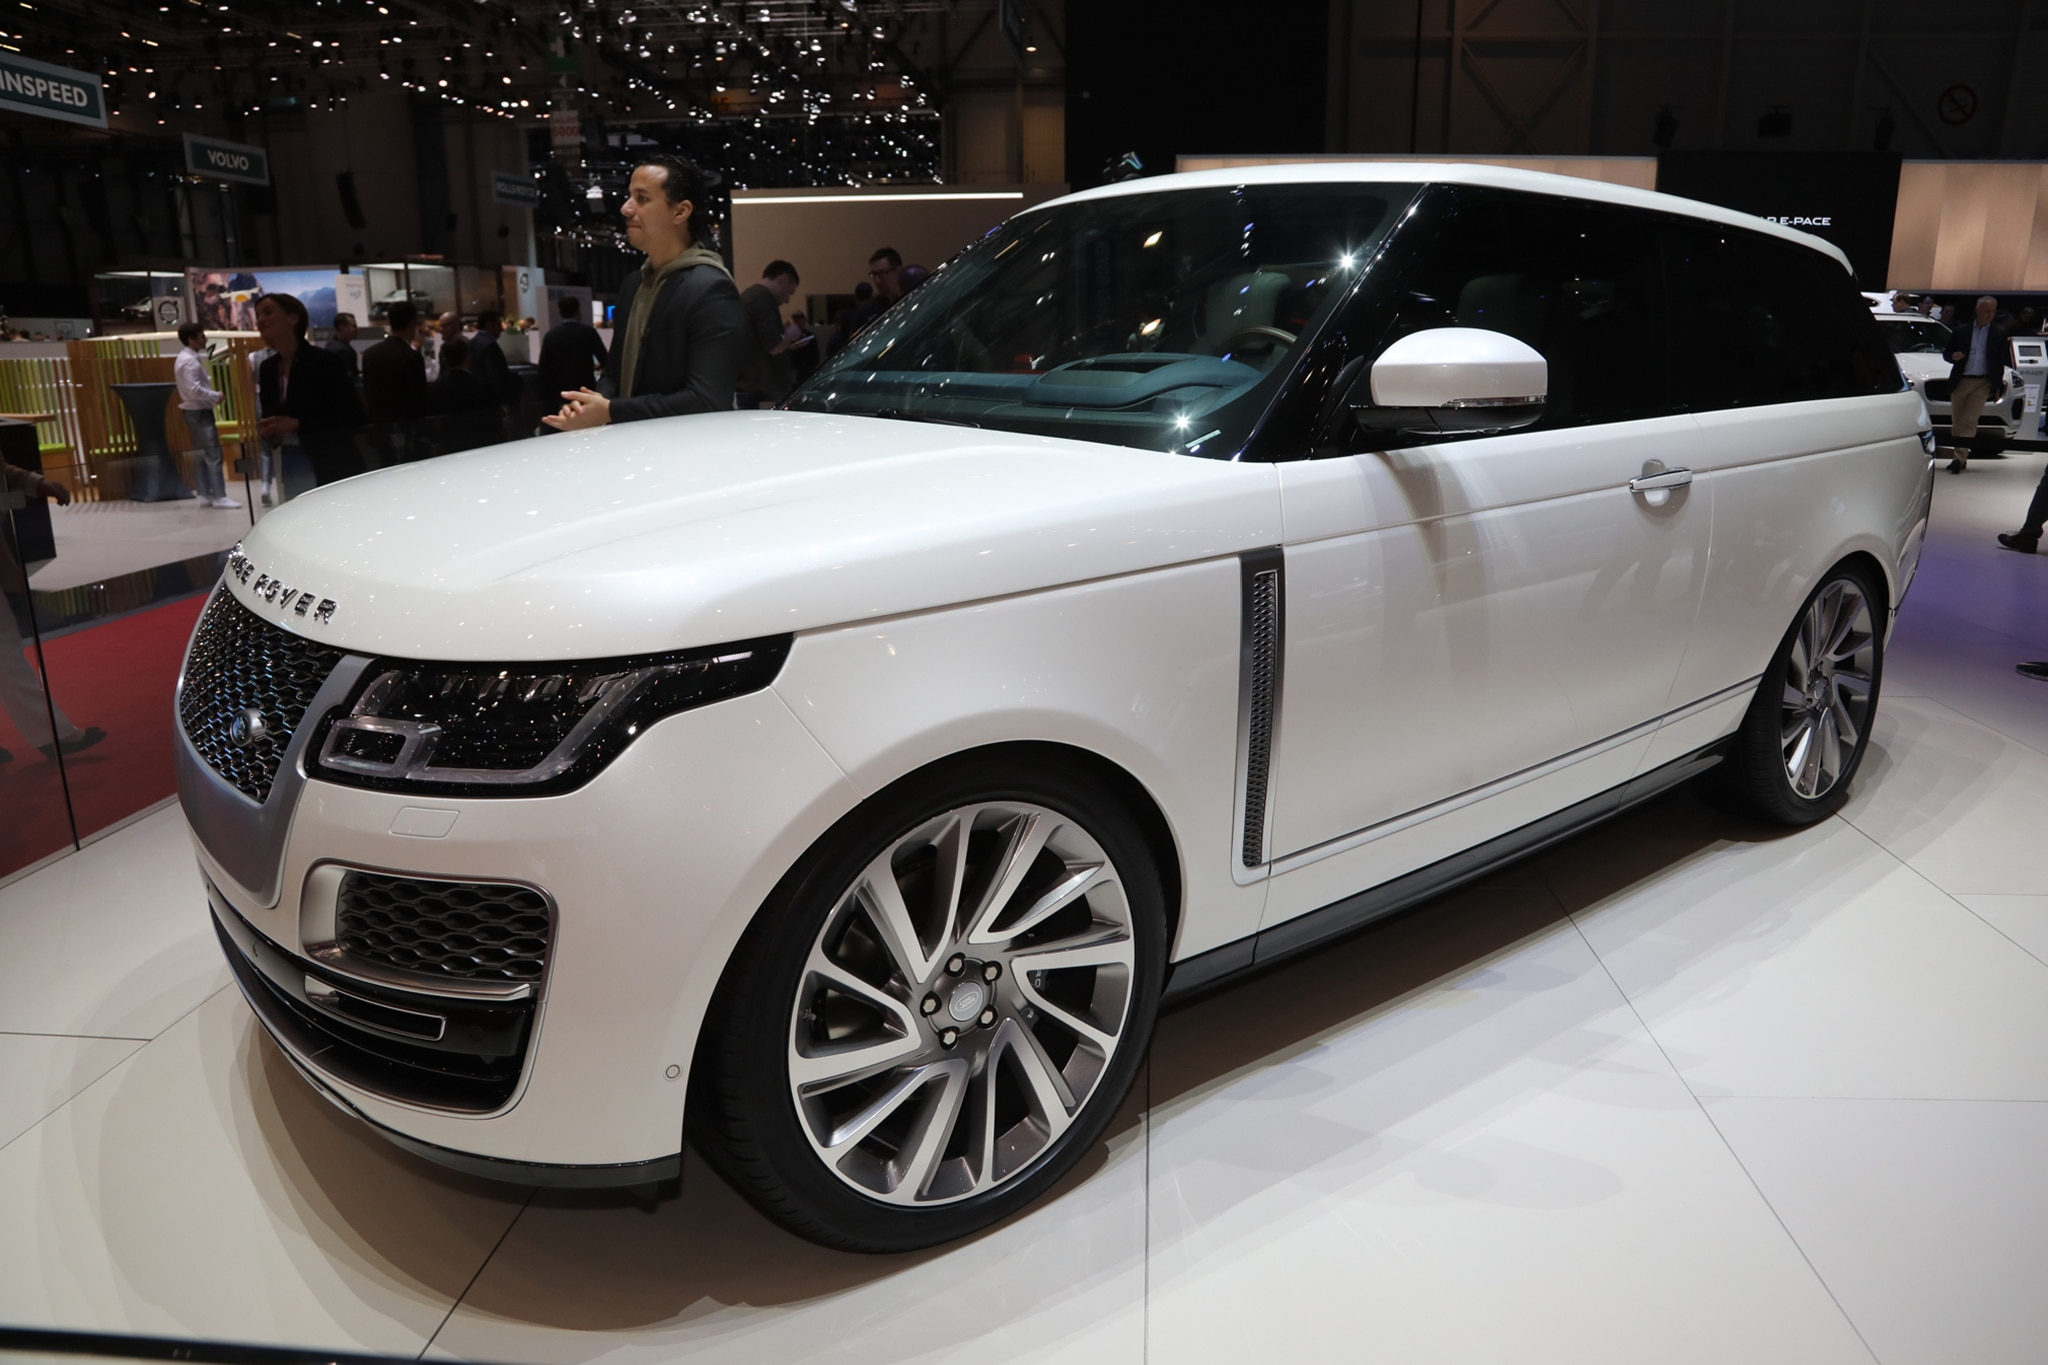 Range Rover SV Coupe 03